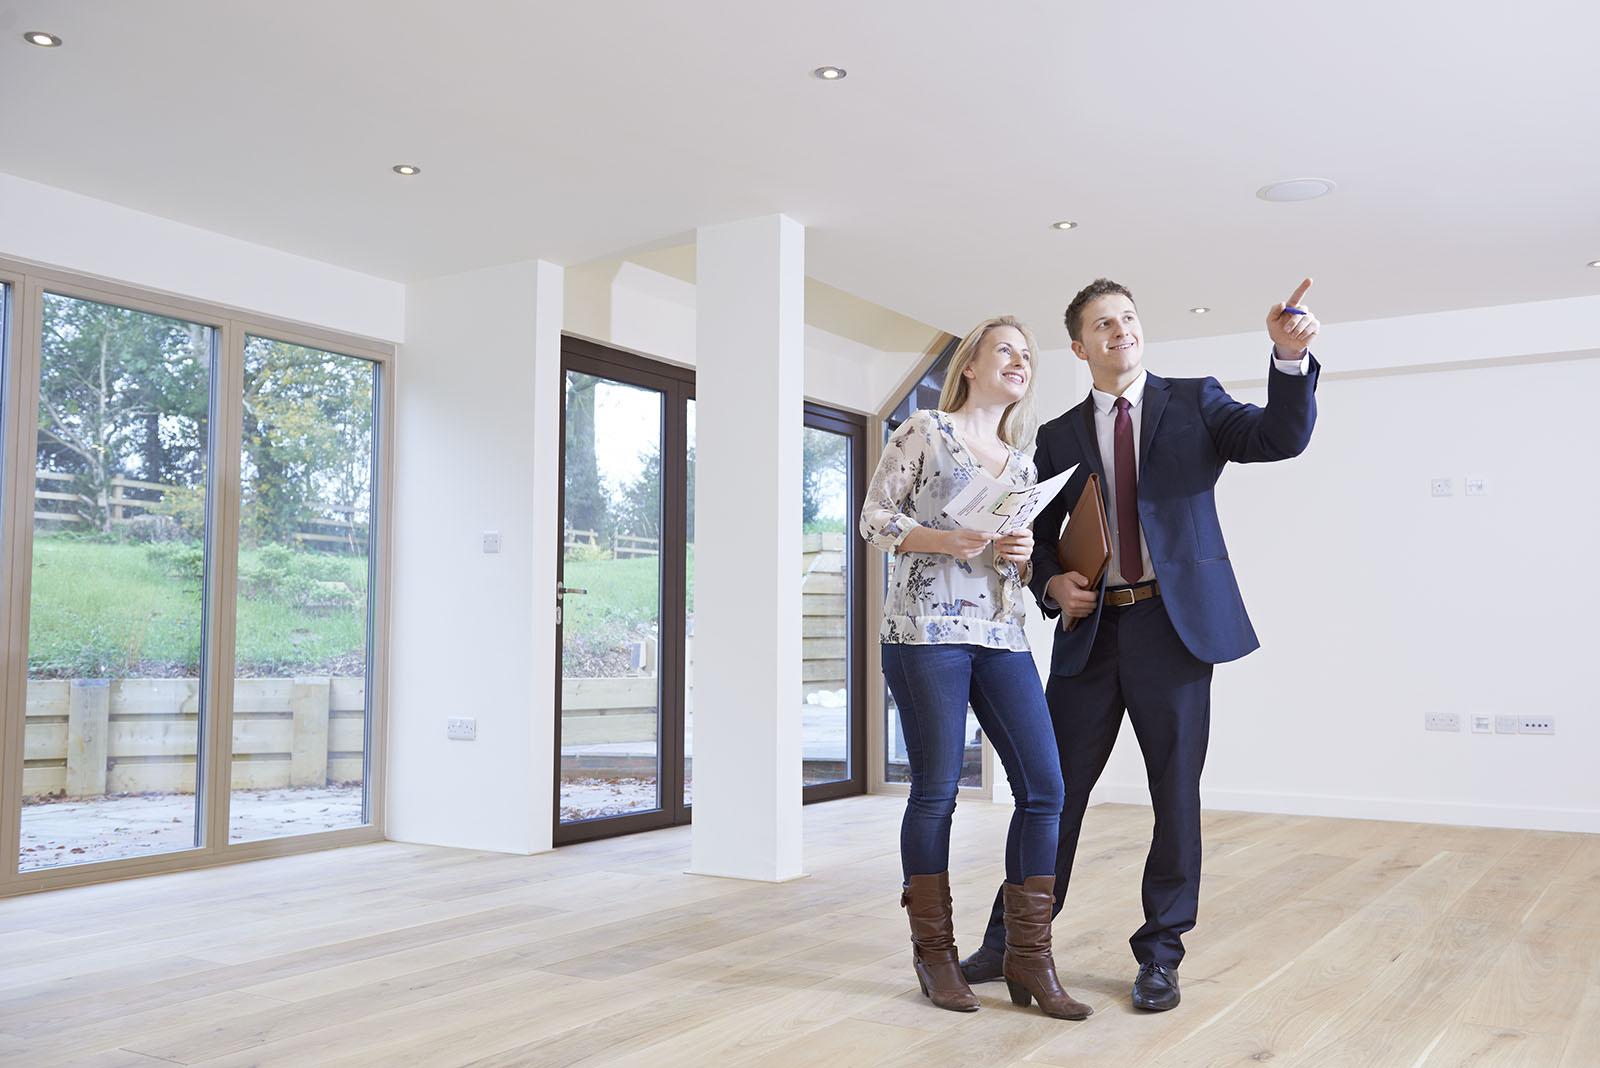 estate agents (2)